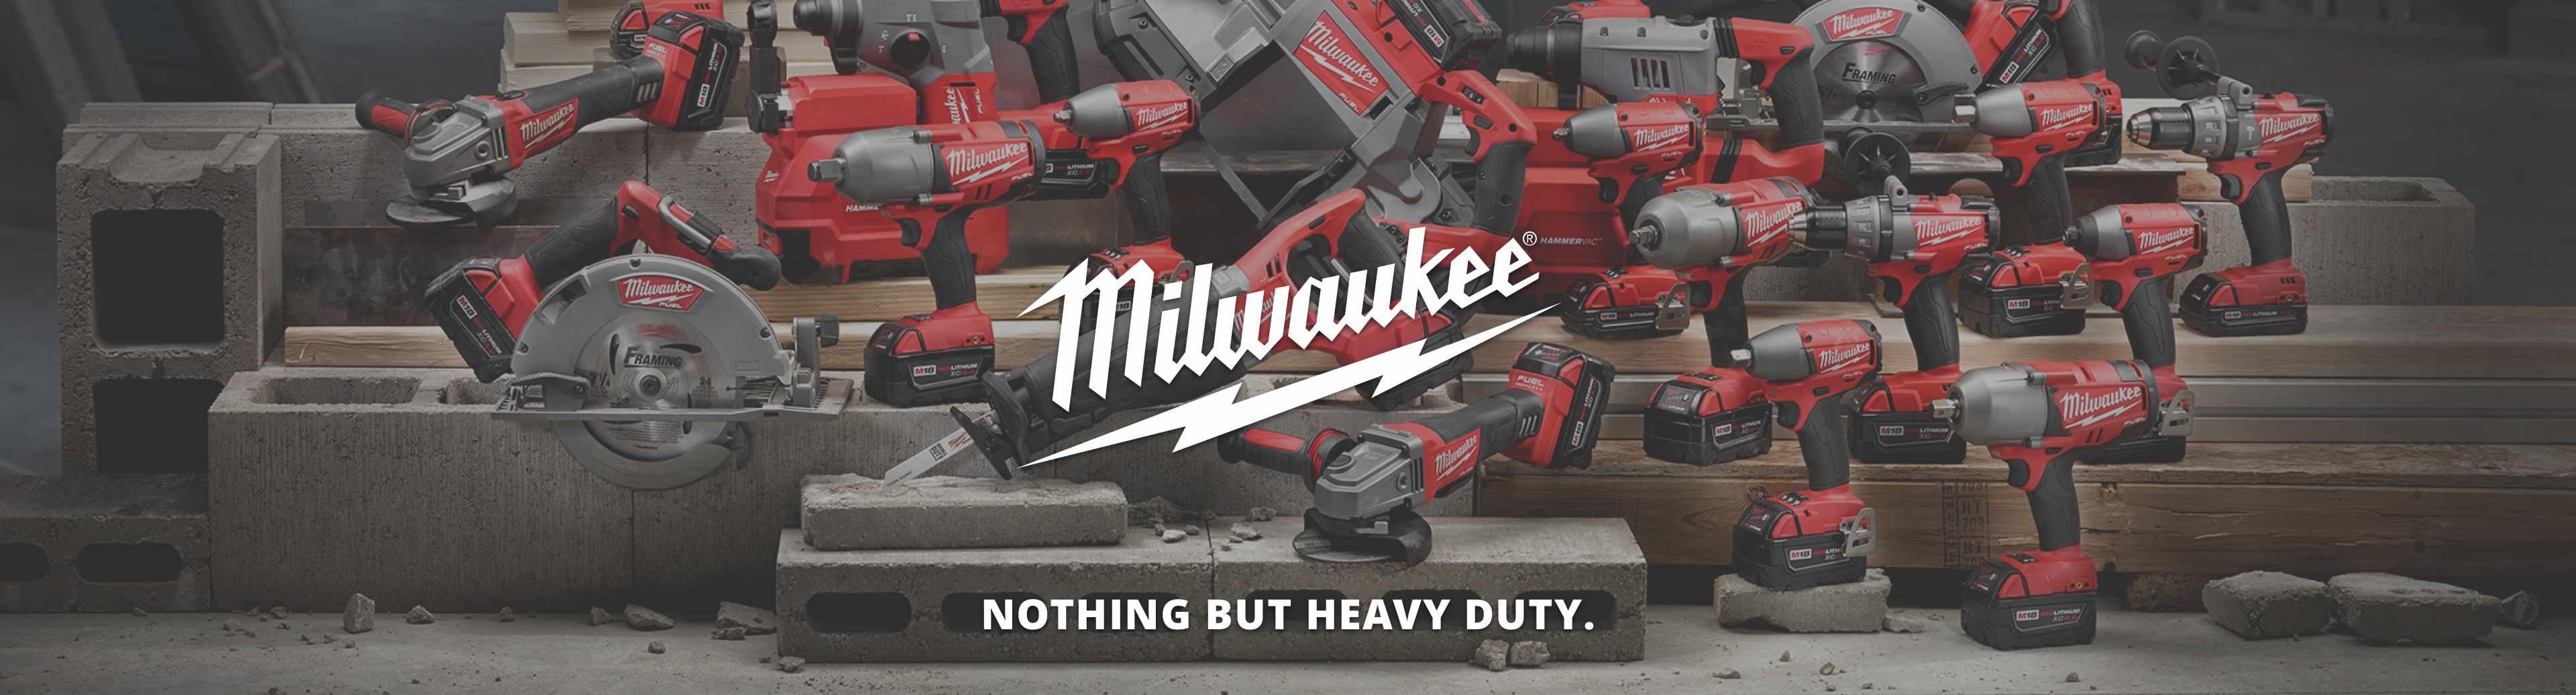 Shop Milwaukee power tools at Seward Lumber